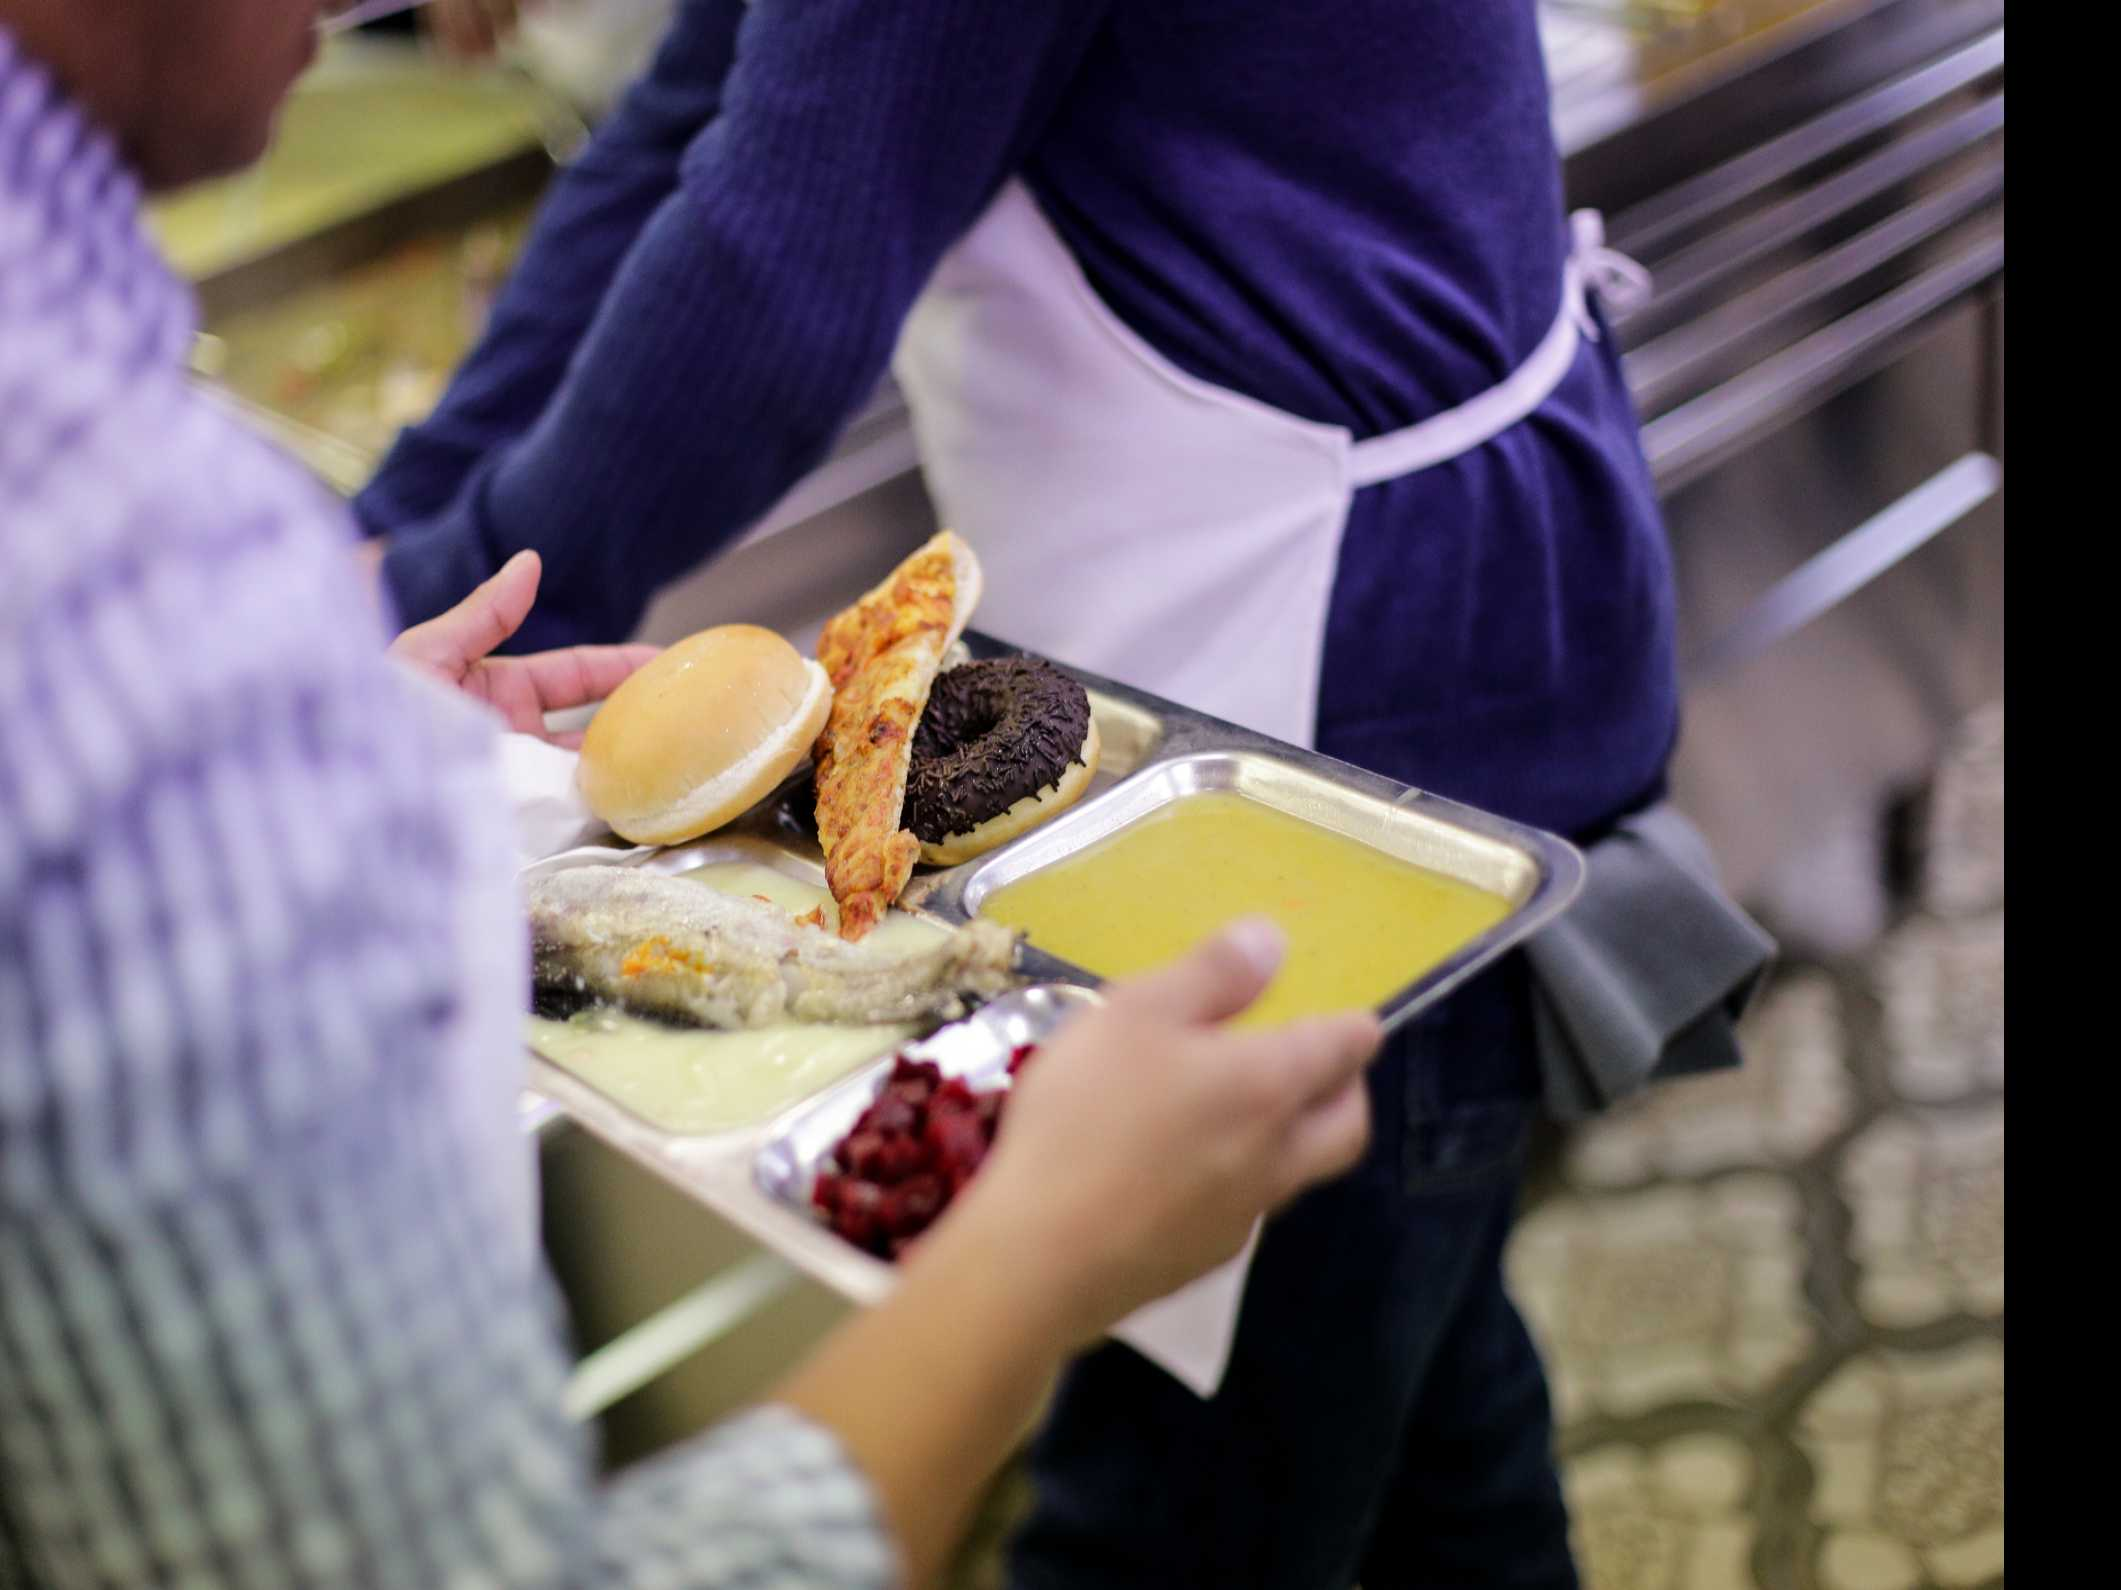 AC Convention Center Cooks Xmas Dinner for 1,800